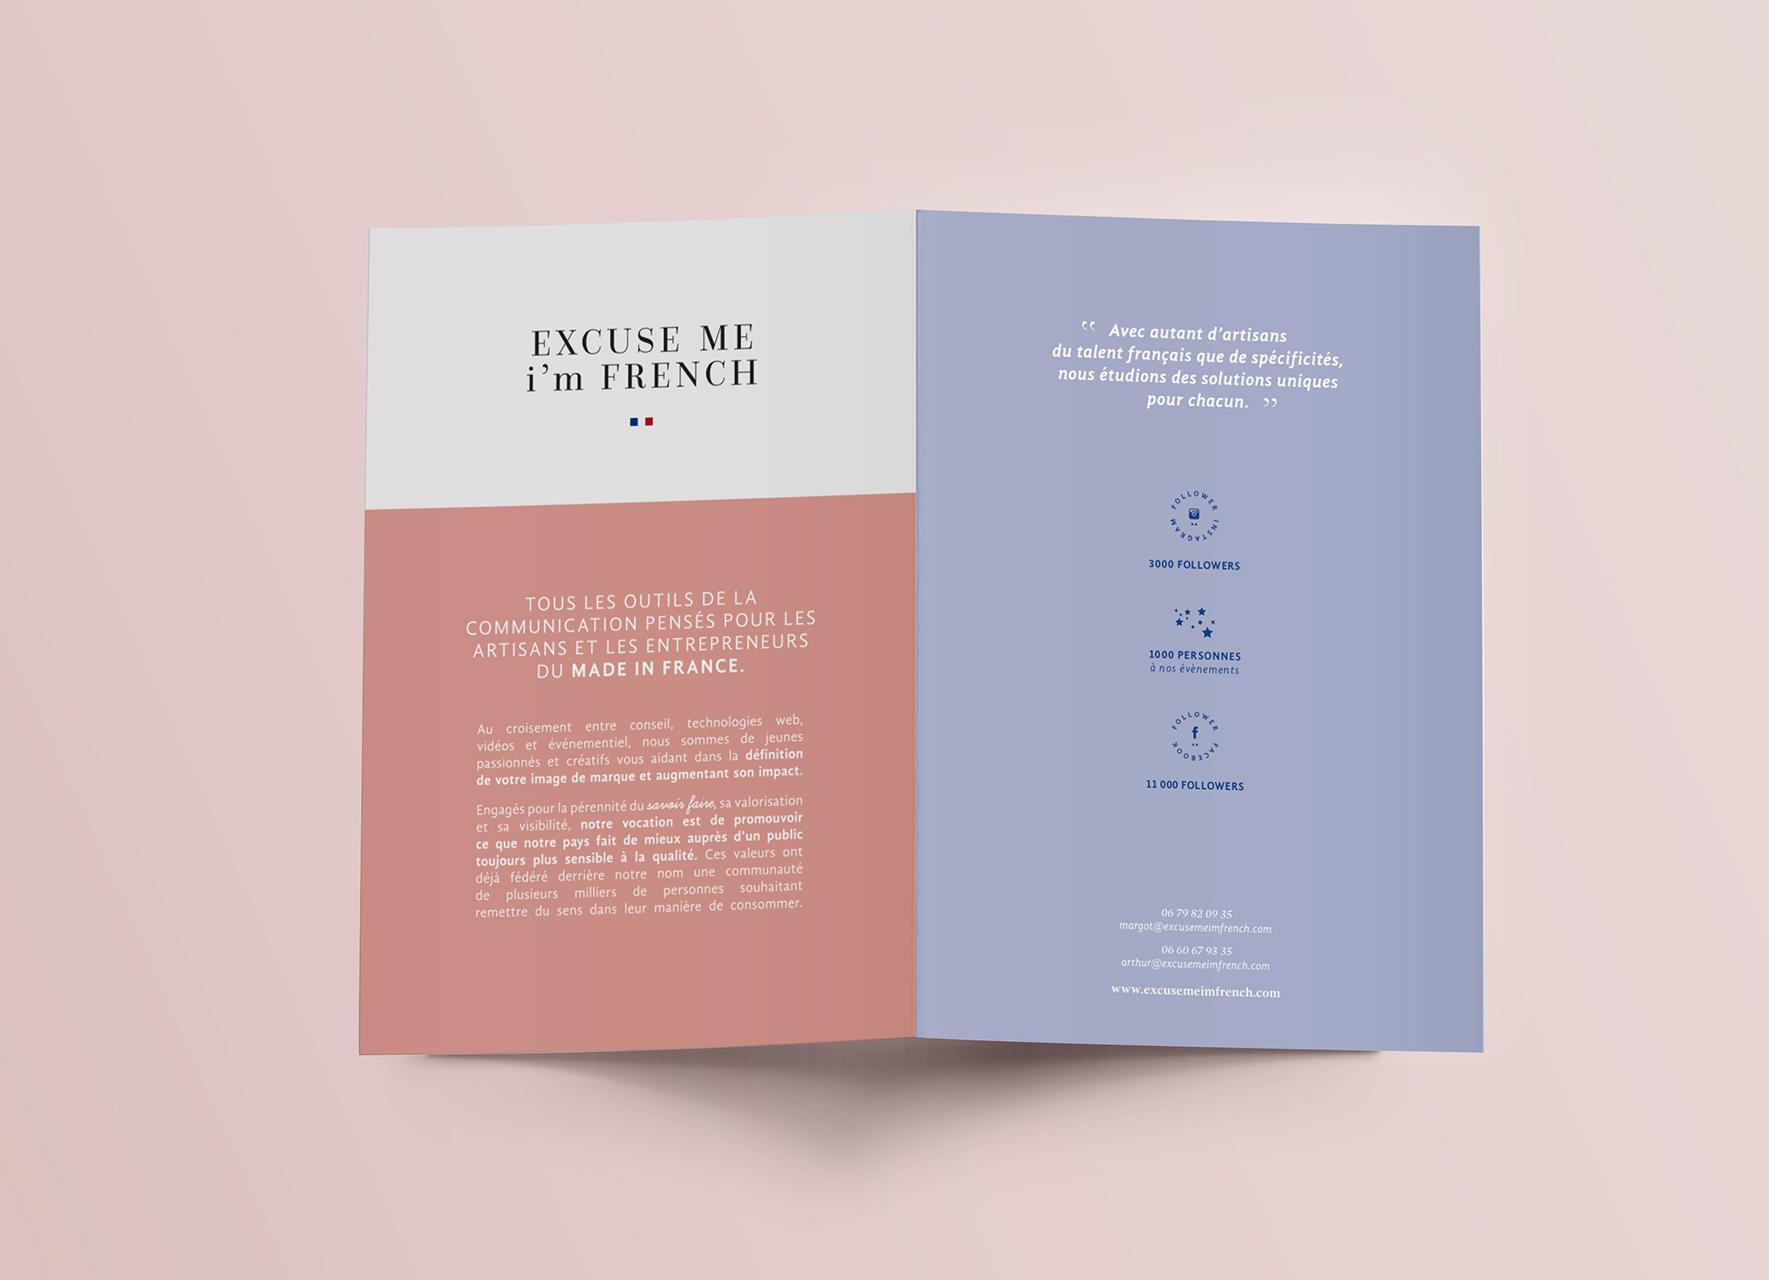 EMIF-page4.jpg